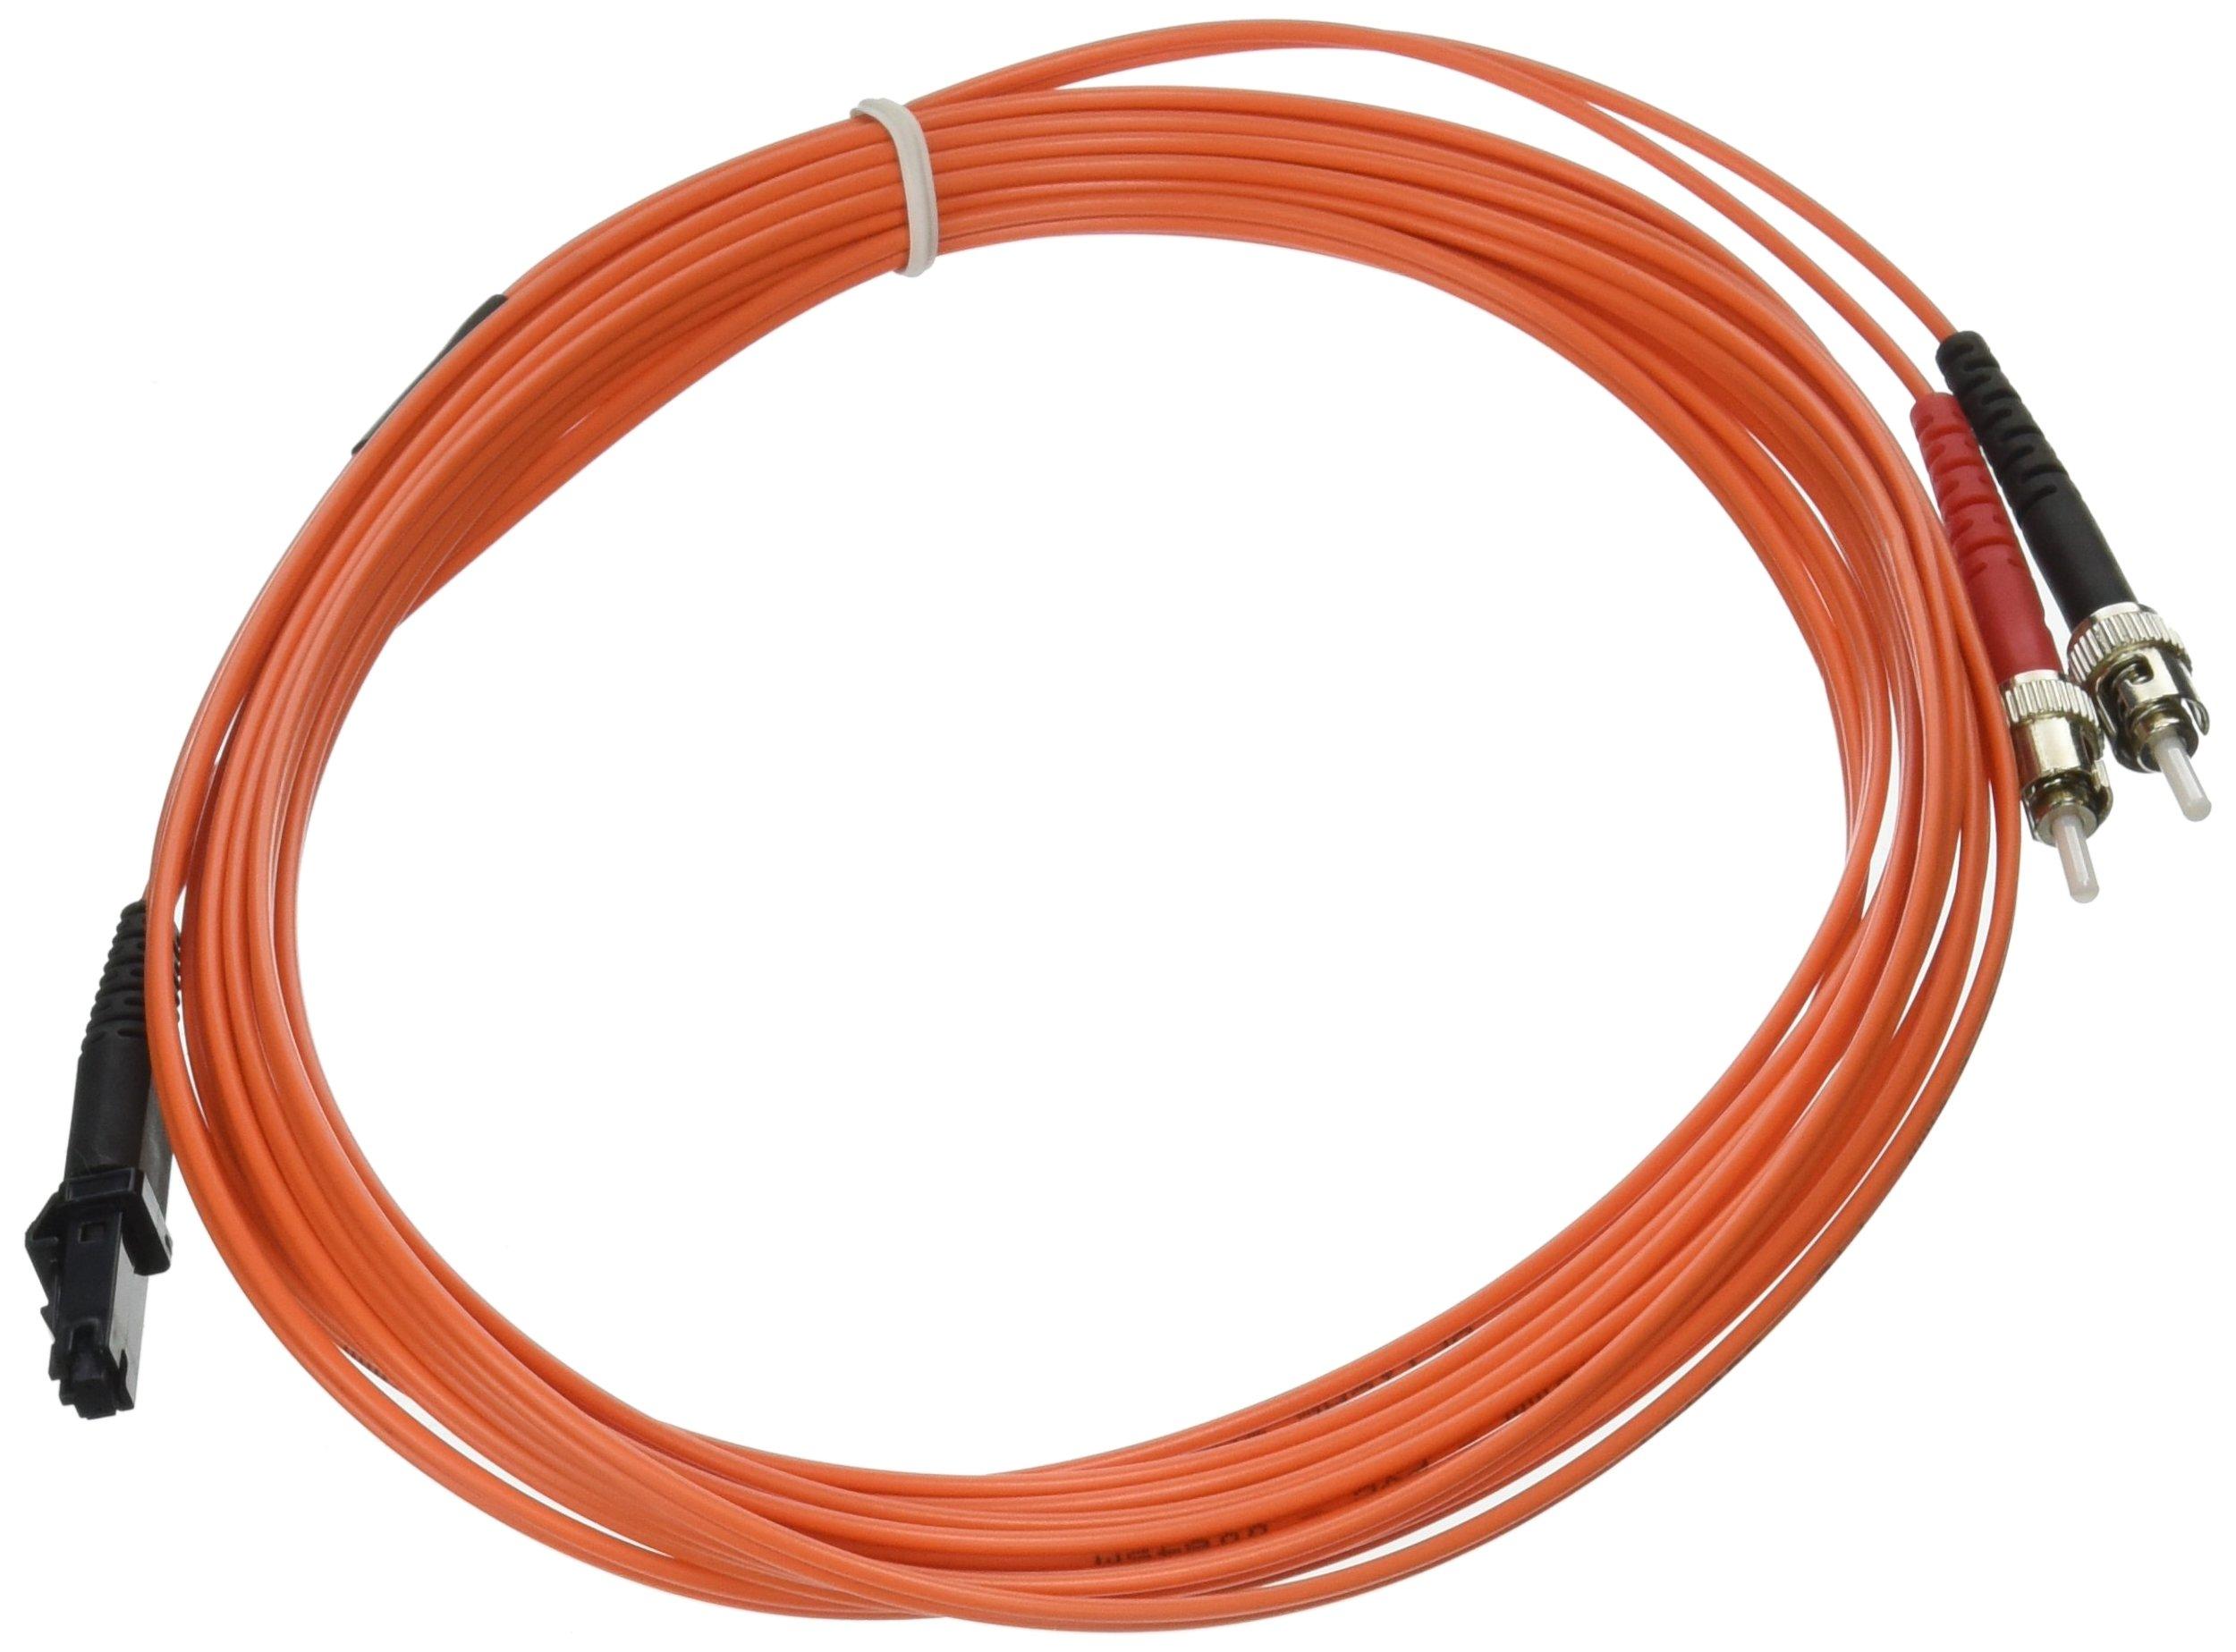 C2G Cables to Go 33139 MTRJ-ST 62.5/125 OM1 Duplex Multimode PVC Fiber Optic Cable (5 Meters, Orange)